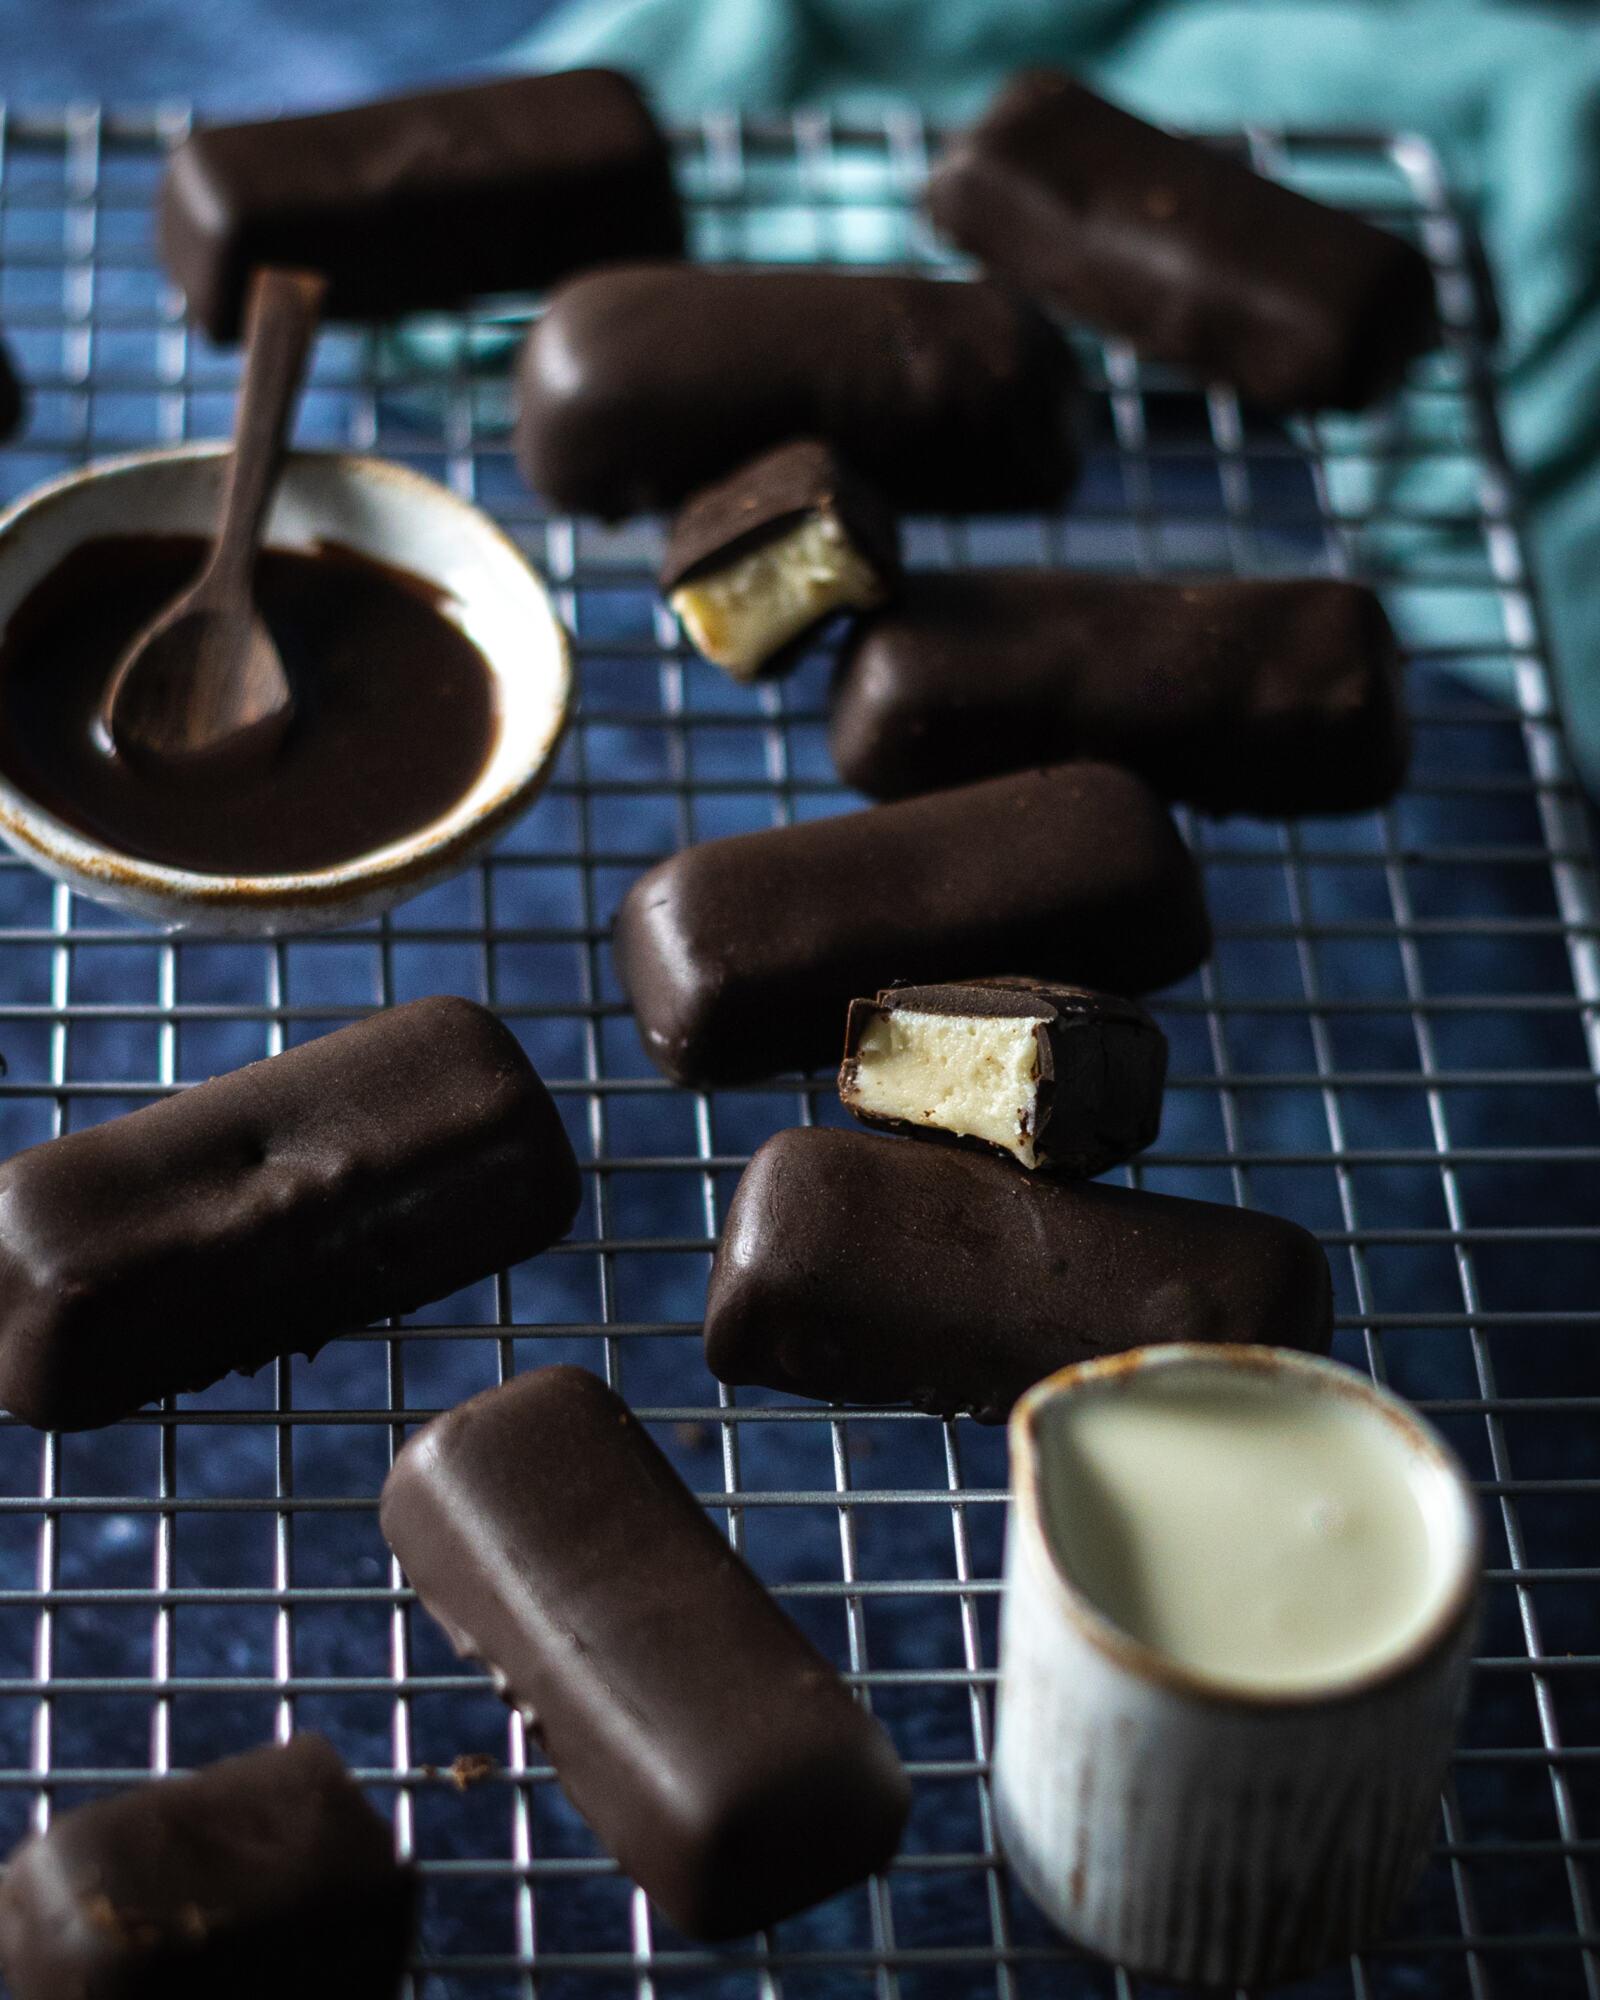 Vegan Kinder Chocolate Bars